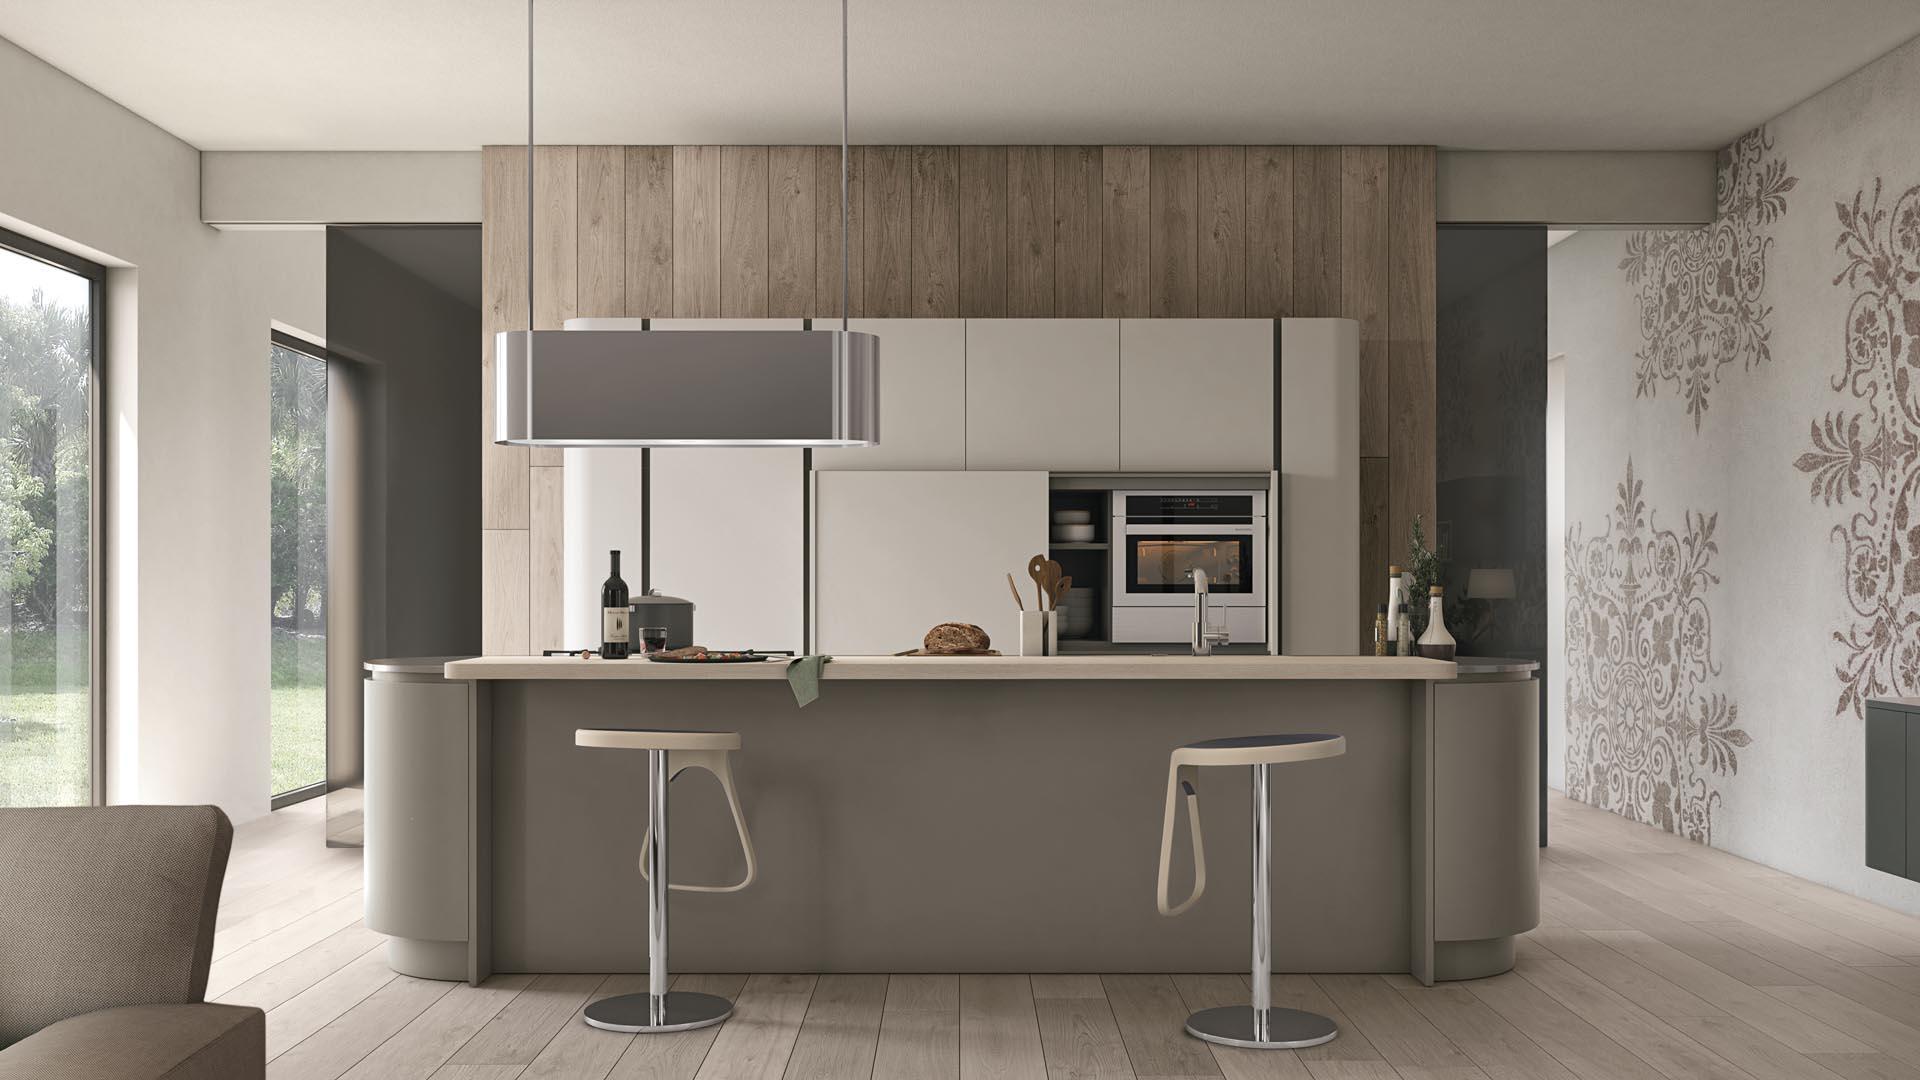 Cucina clover lube raimondi idee casa crespellano for Outlet cucine trento